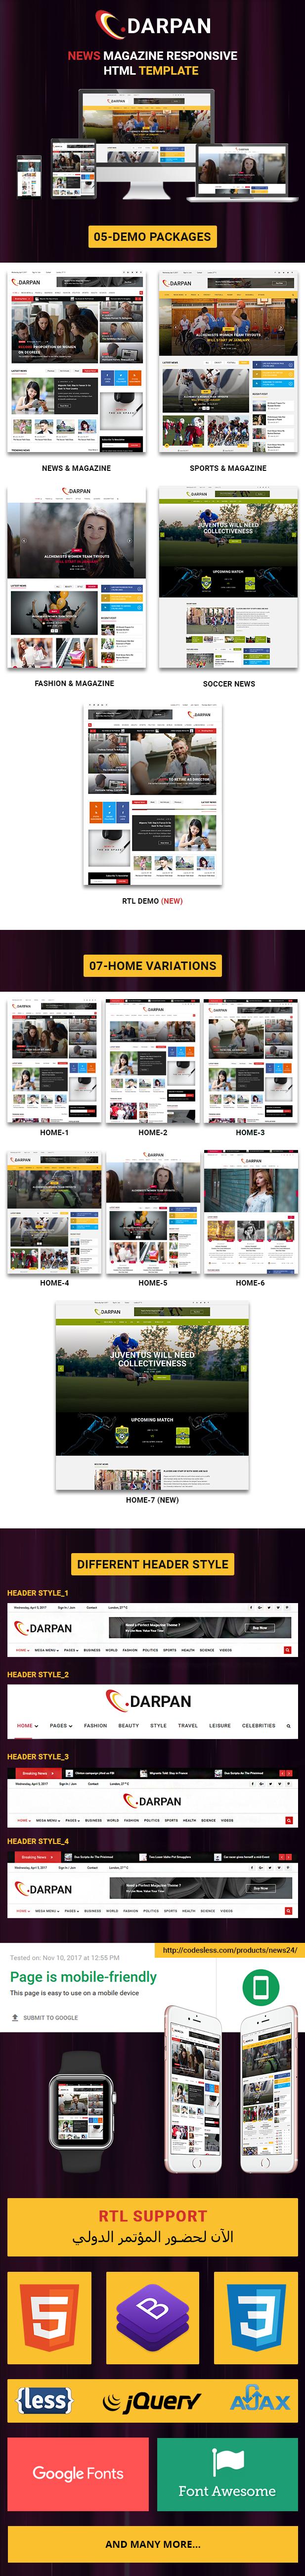 News 24 - News Magazine Responsive HTML Template